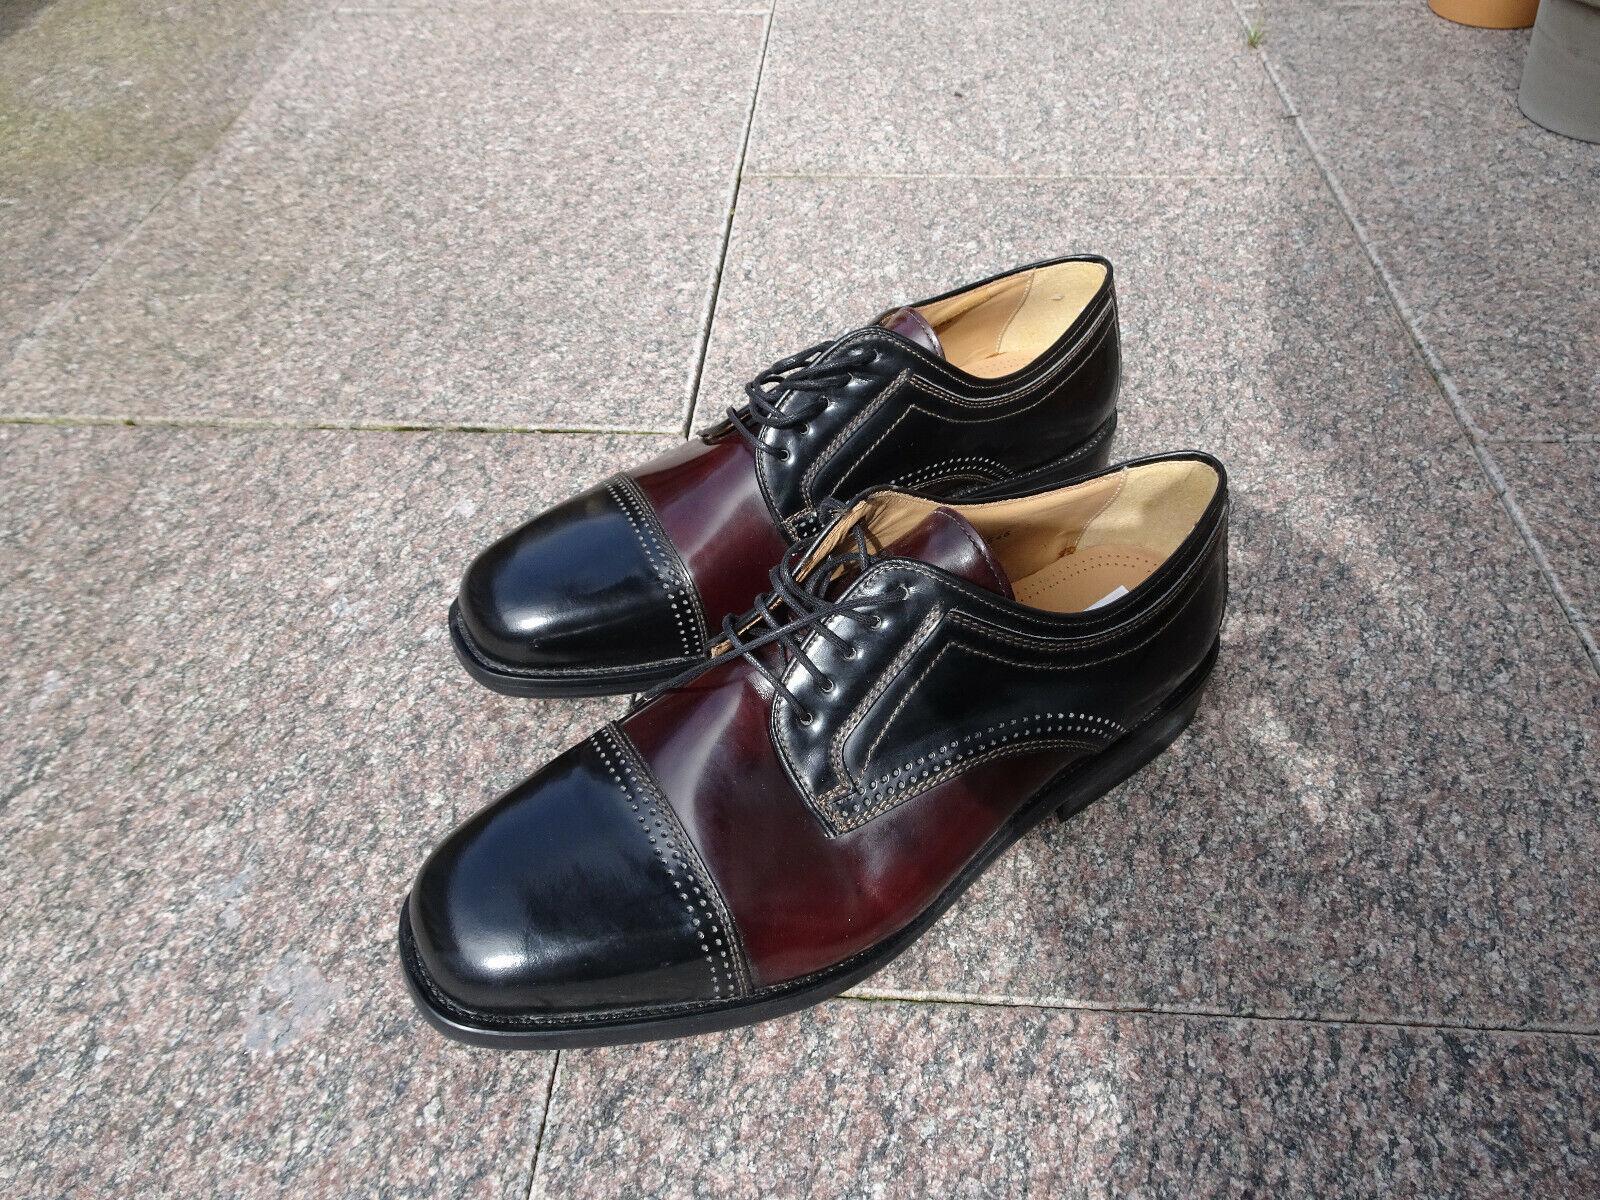 Schuhe Echtleder Ledersohle Größe 13    49 elegant braun   schwarz Depeche